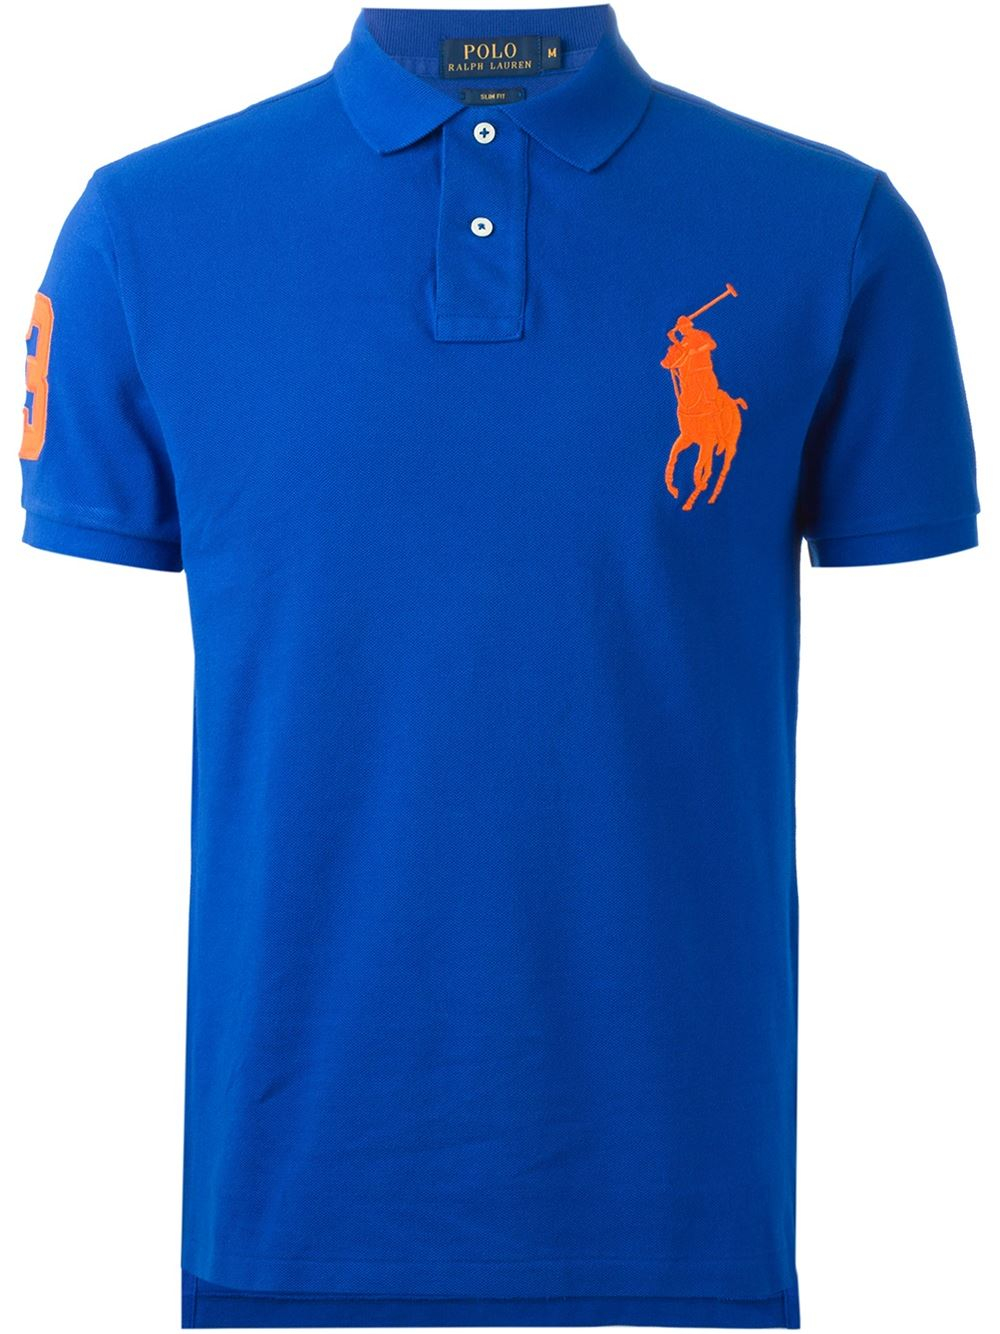 Polo ralph lauren \u0026#39;big Pony\u0026#39; Polo Shirt in Blue for Men | Lyst